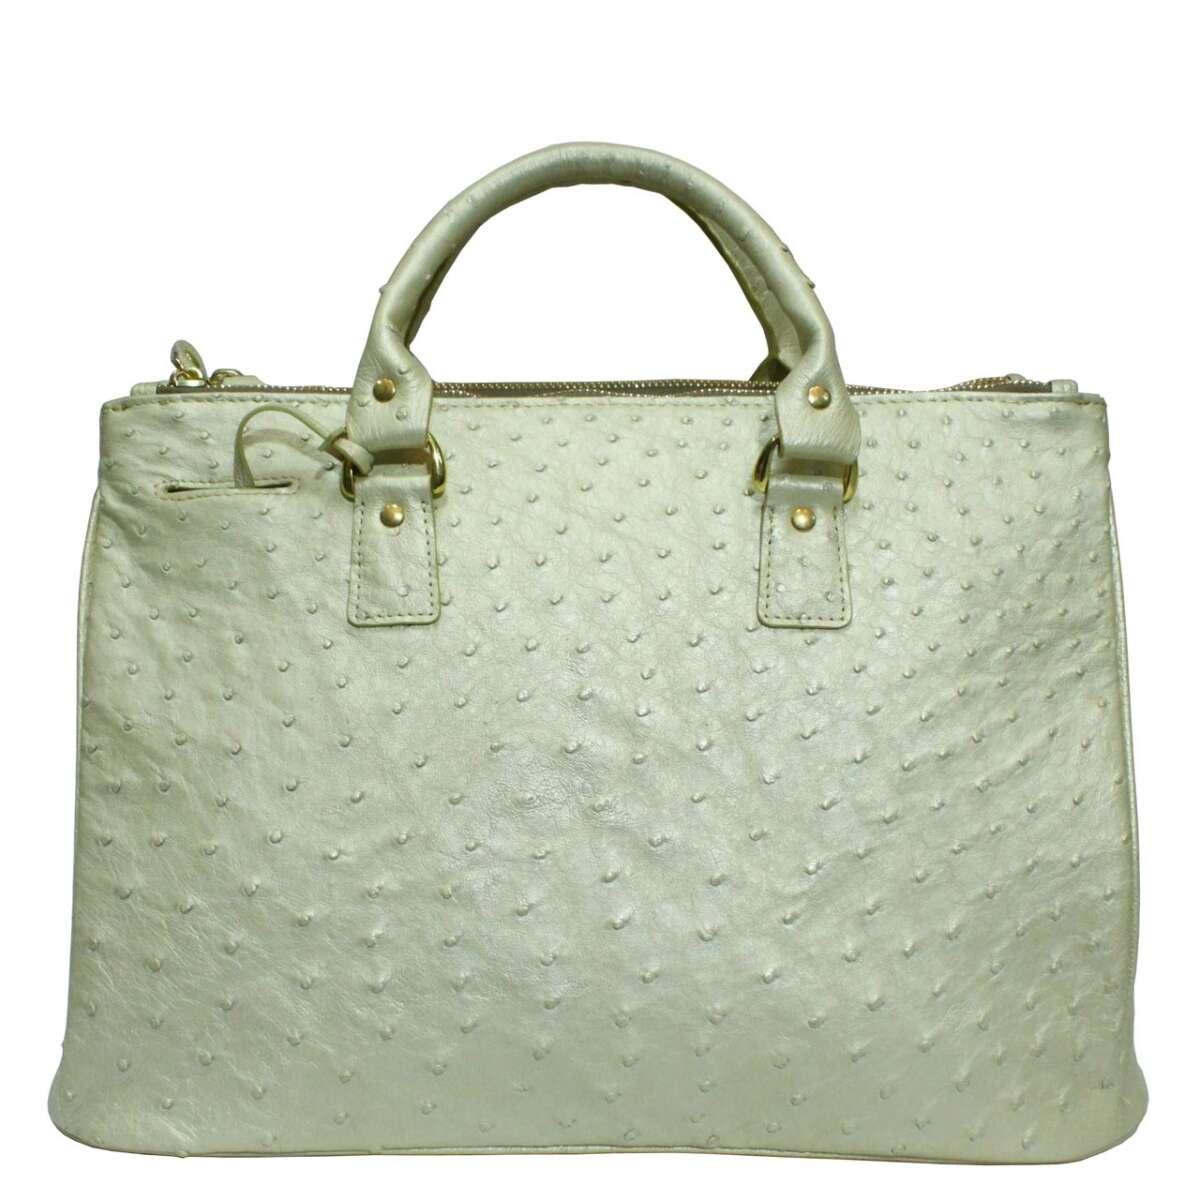 Túi xách nữ da đà điểu E010